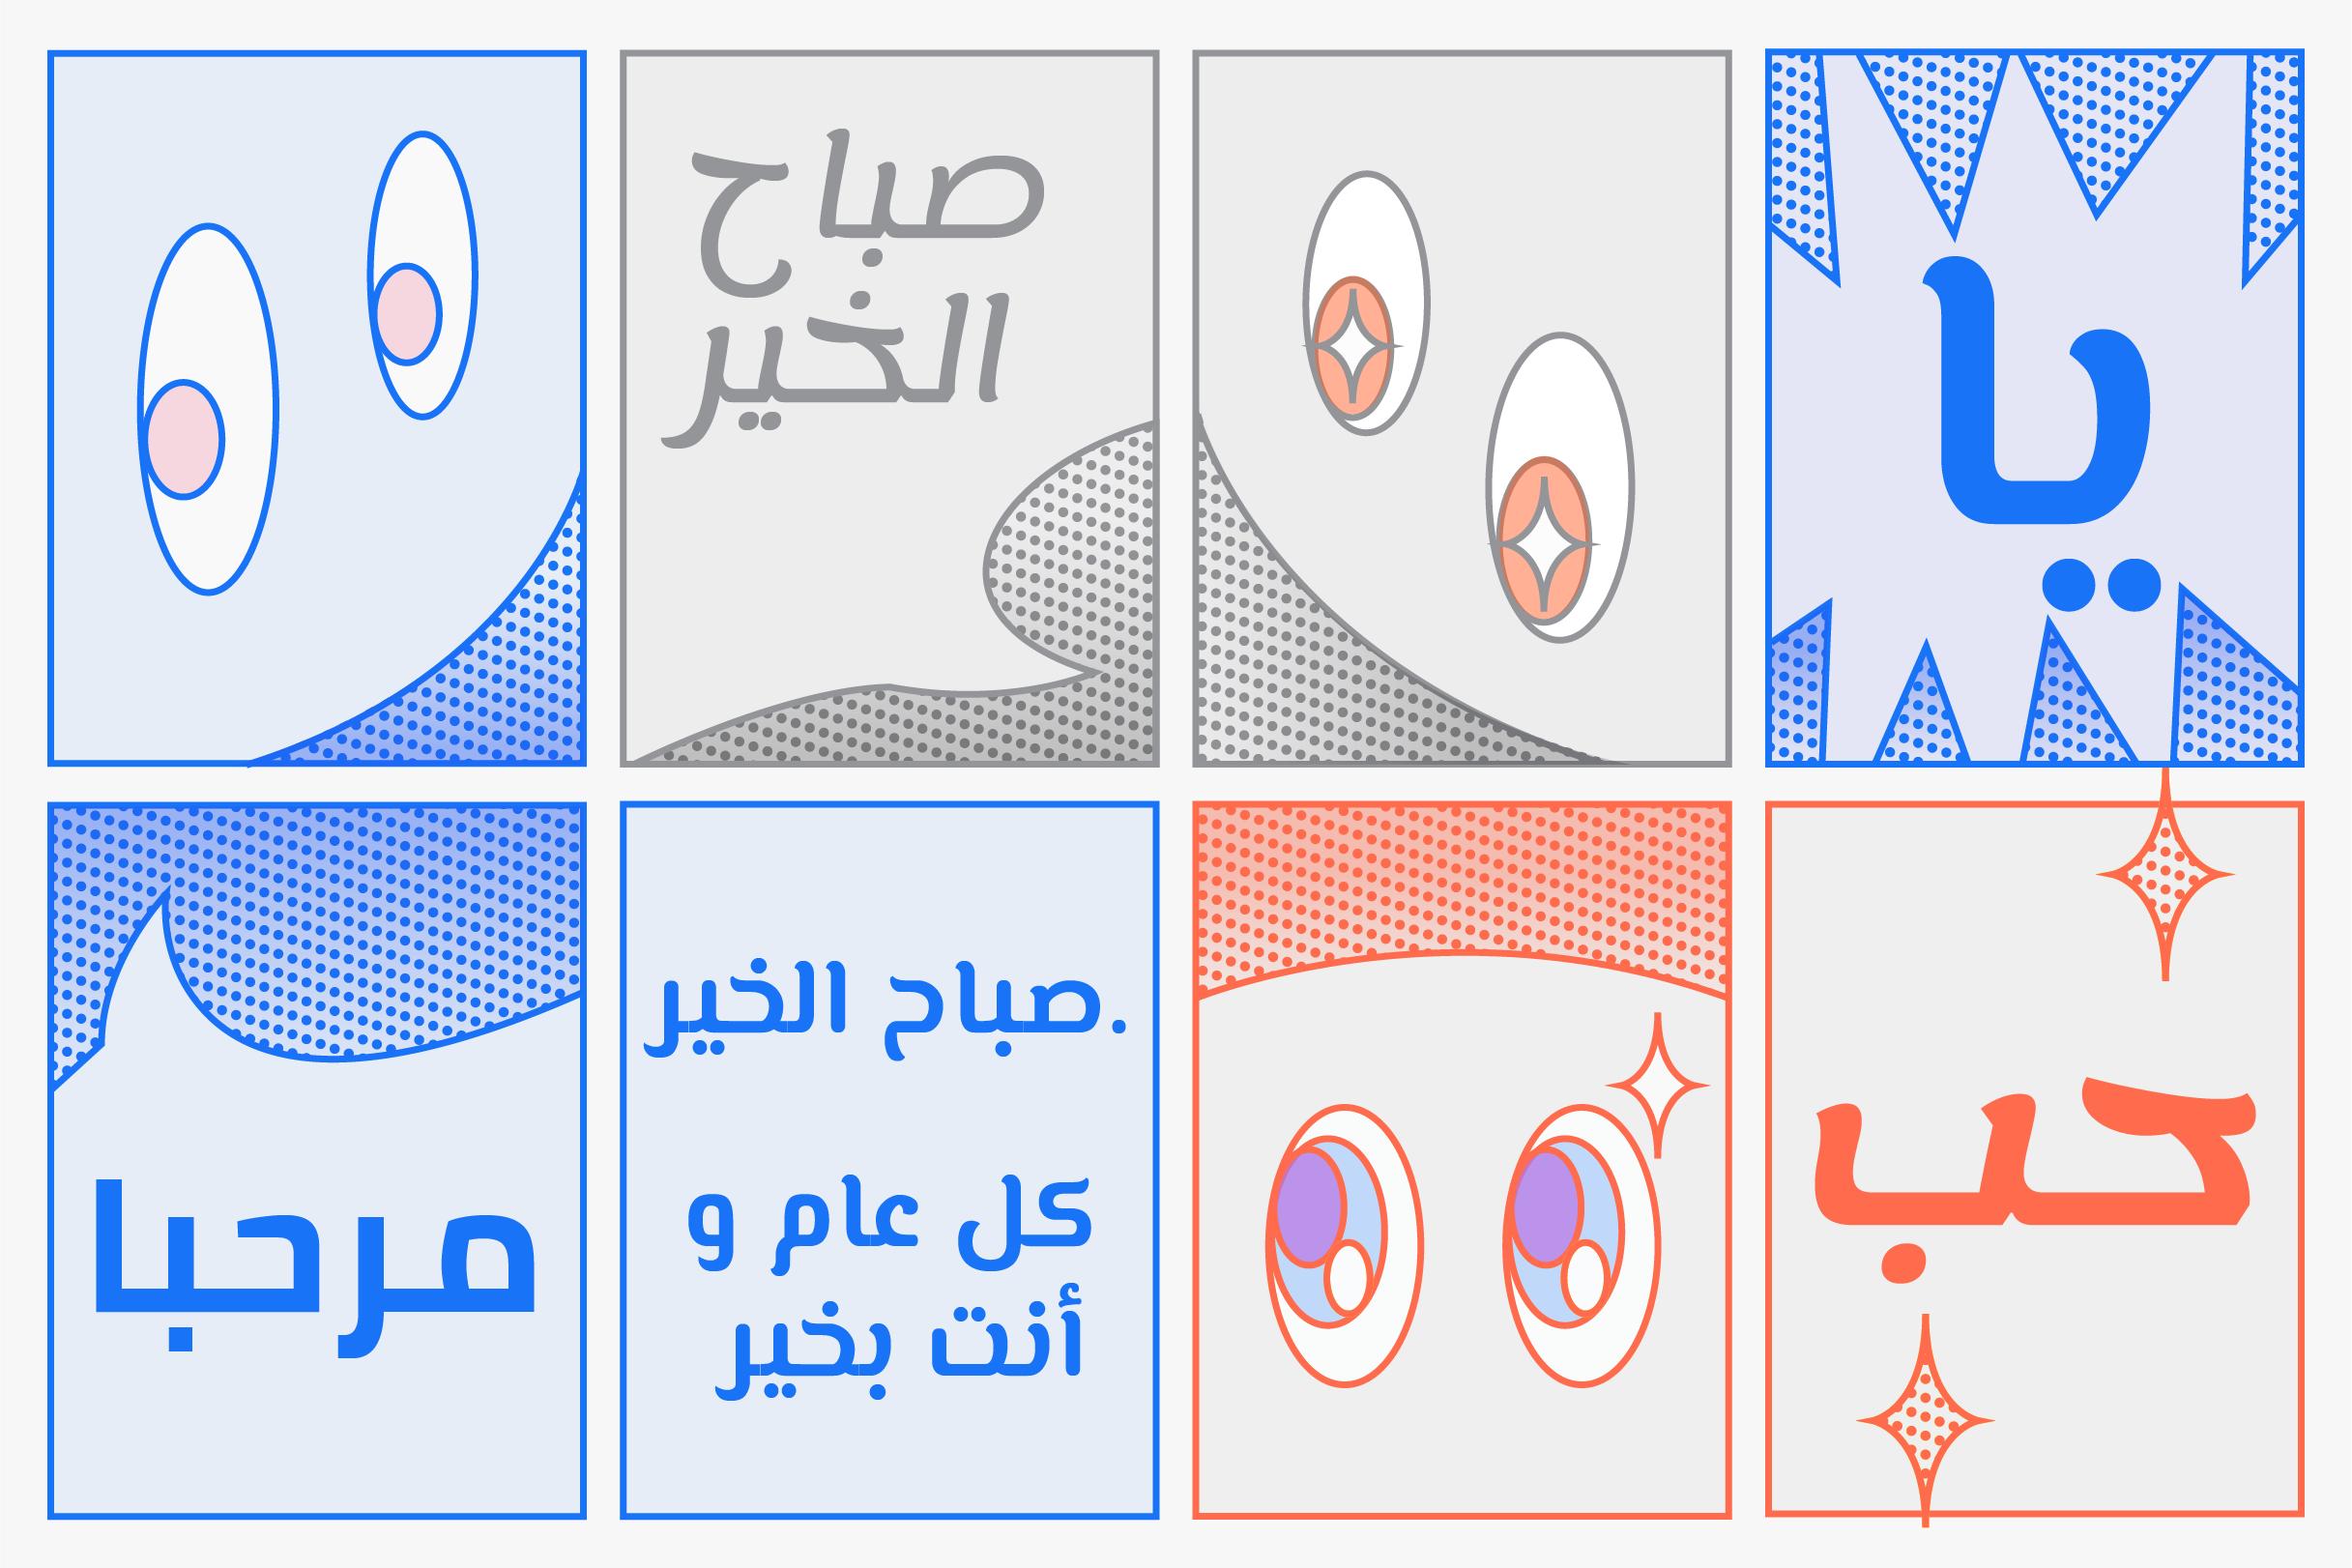 arabic-type_3x2.png